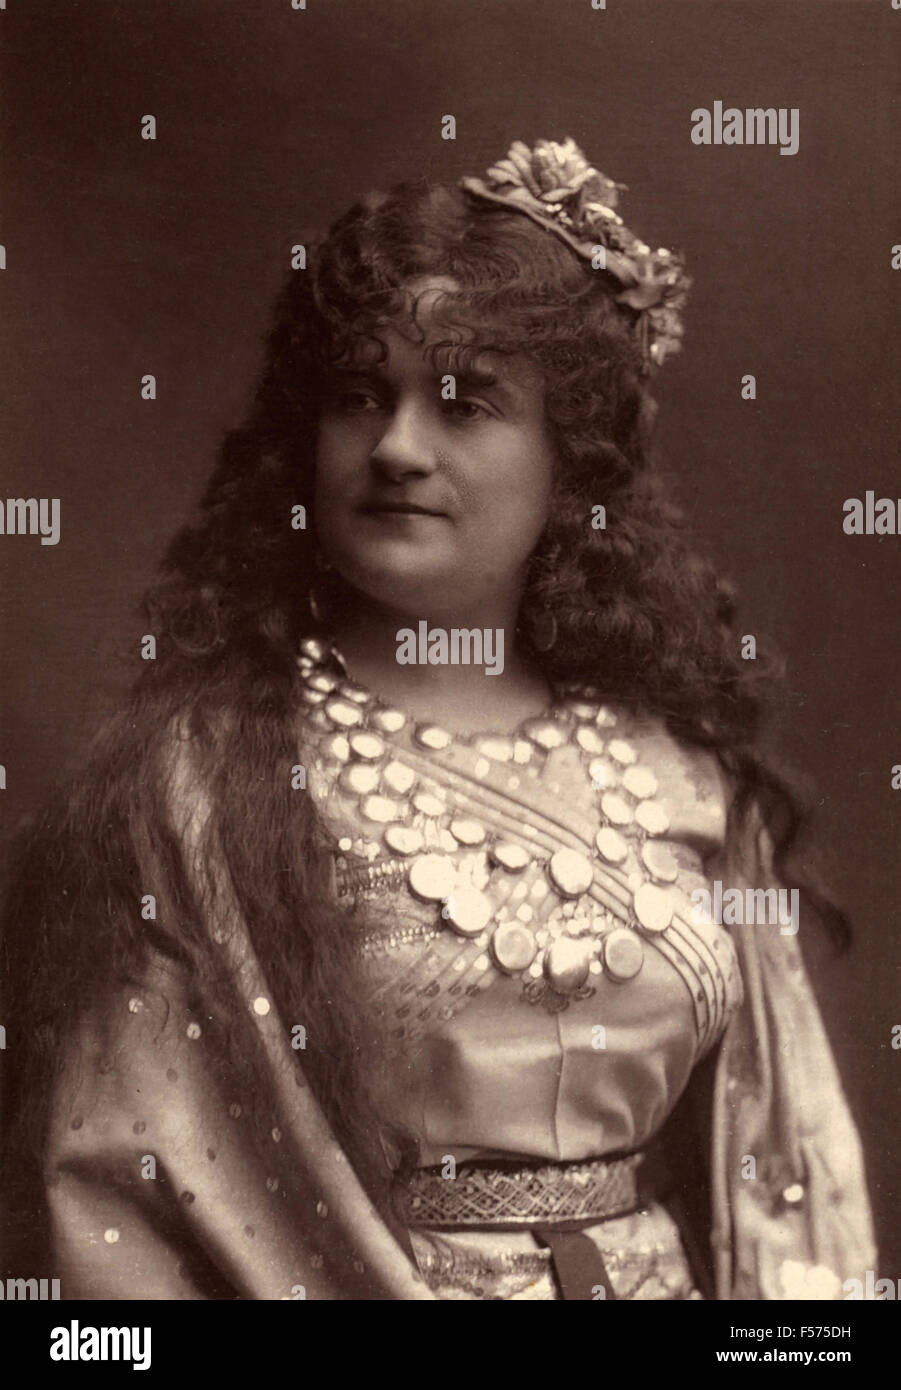 Actress Zulma Bouffar, de la Porte-Saint-Martin - Stock Image